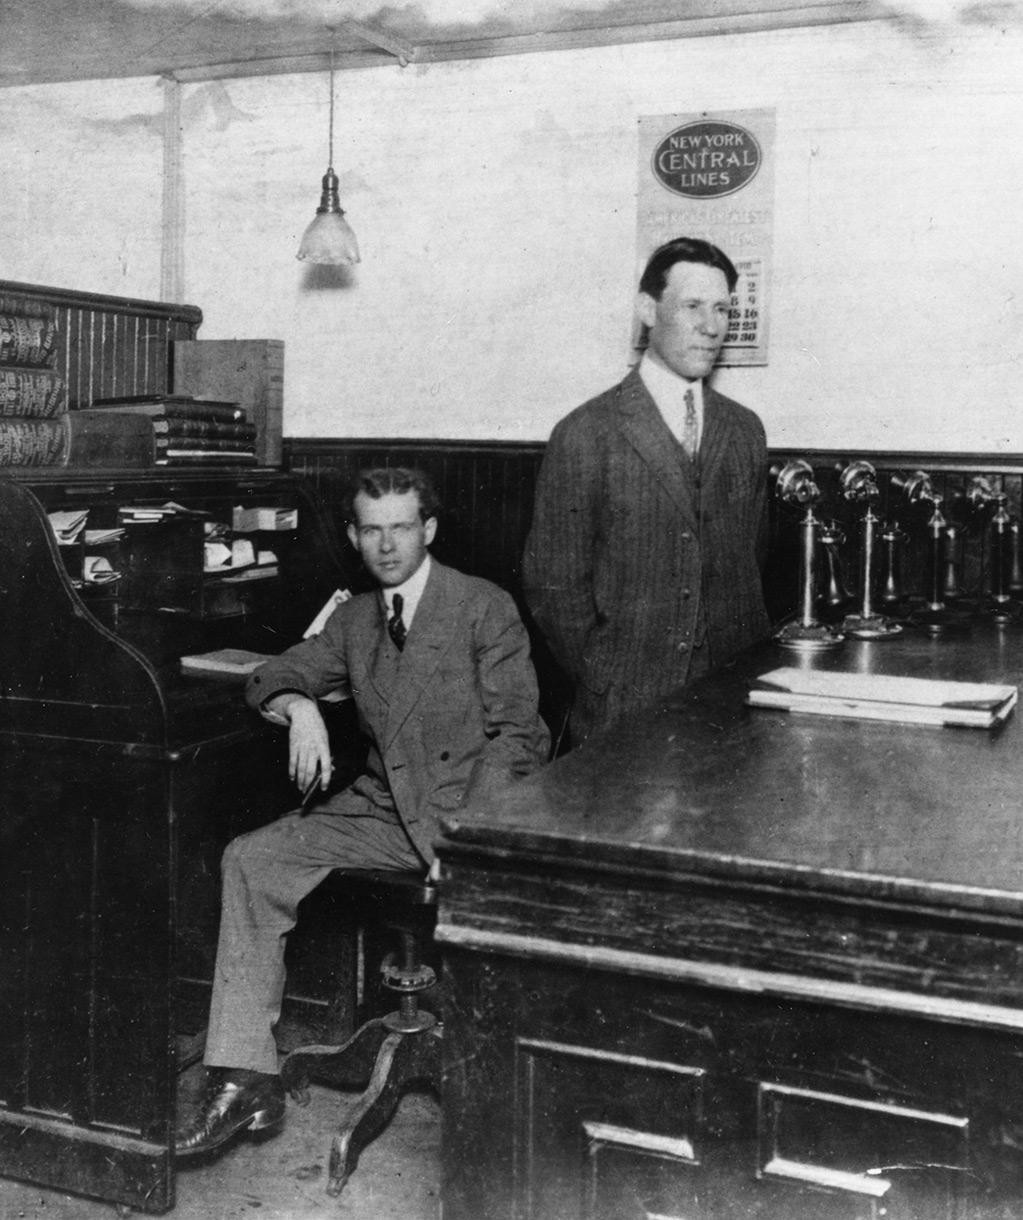 UPS 創始人 Jim Casey 在原來的西雅圖辦公室